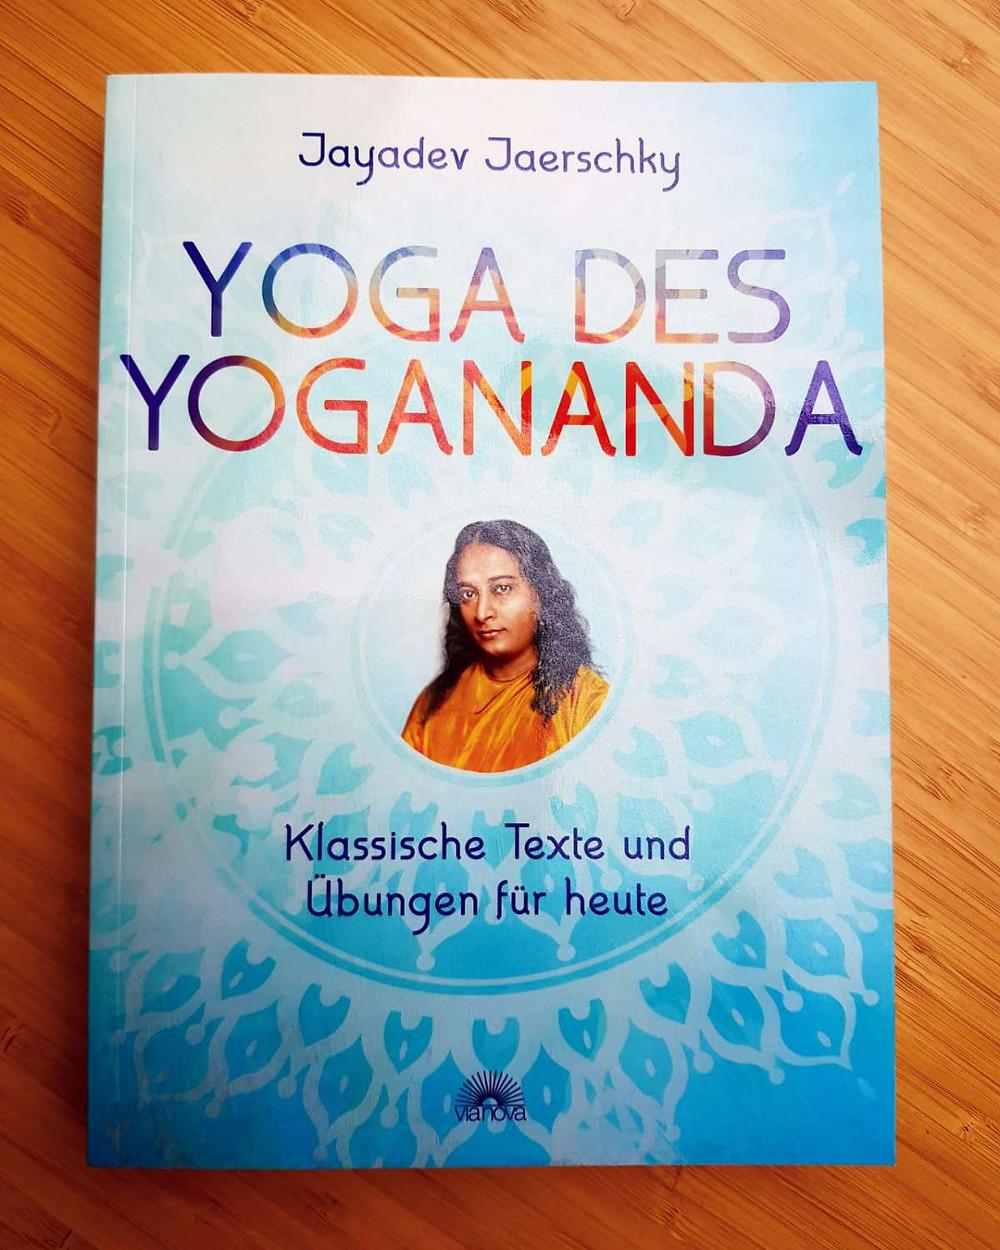 """Yoga des Yogananda"" von Jayadev Jaerschky"